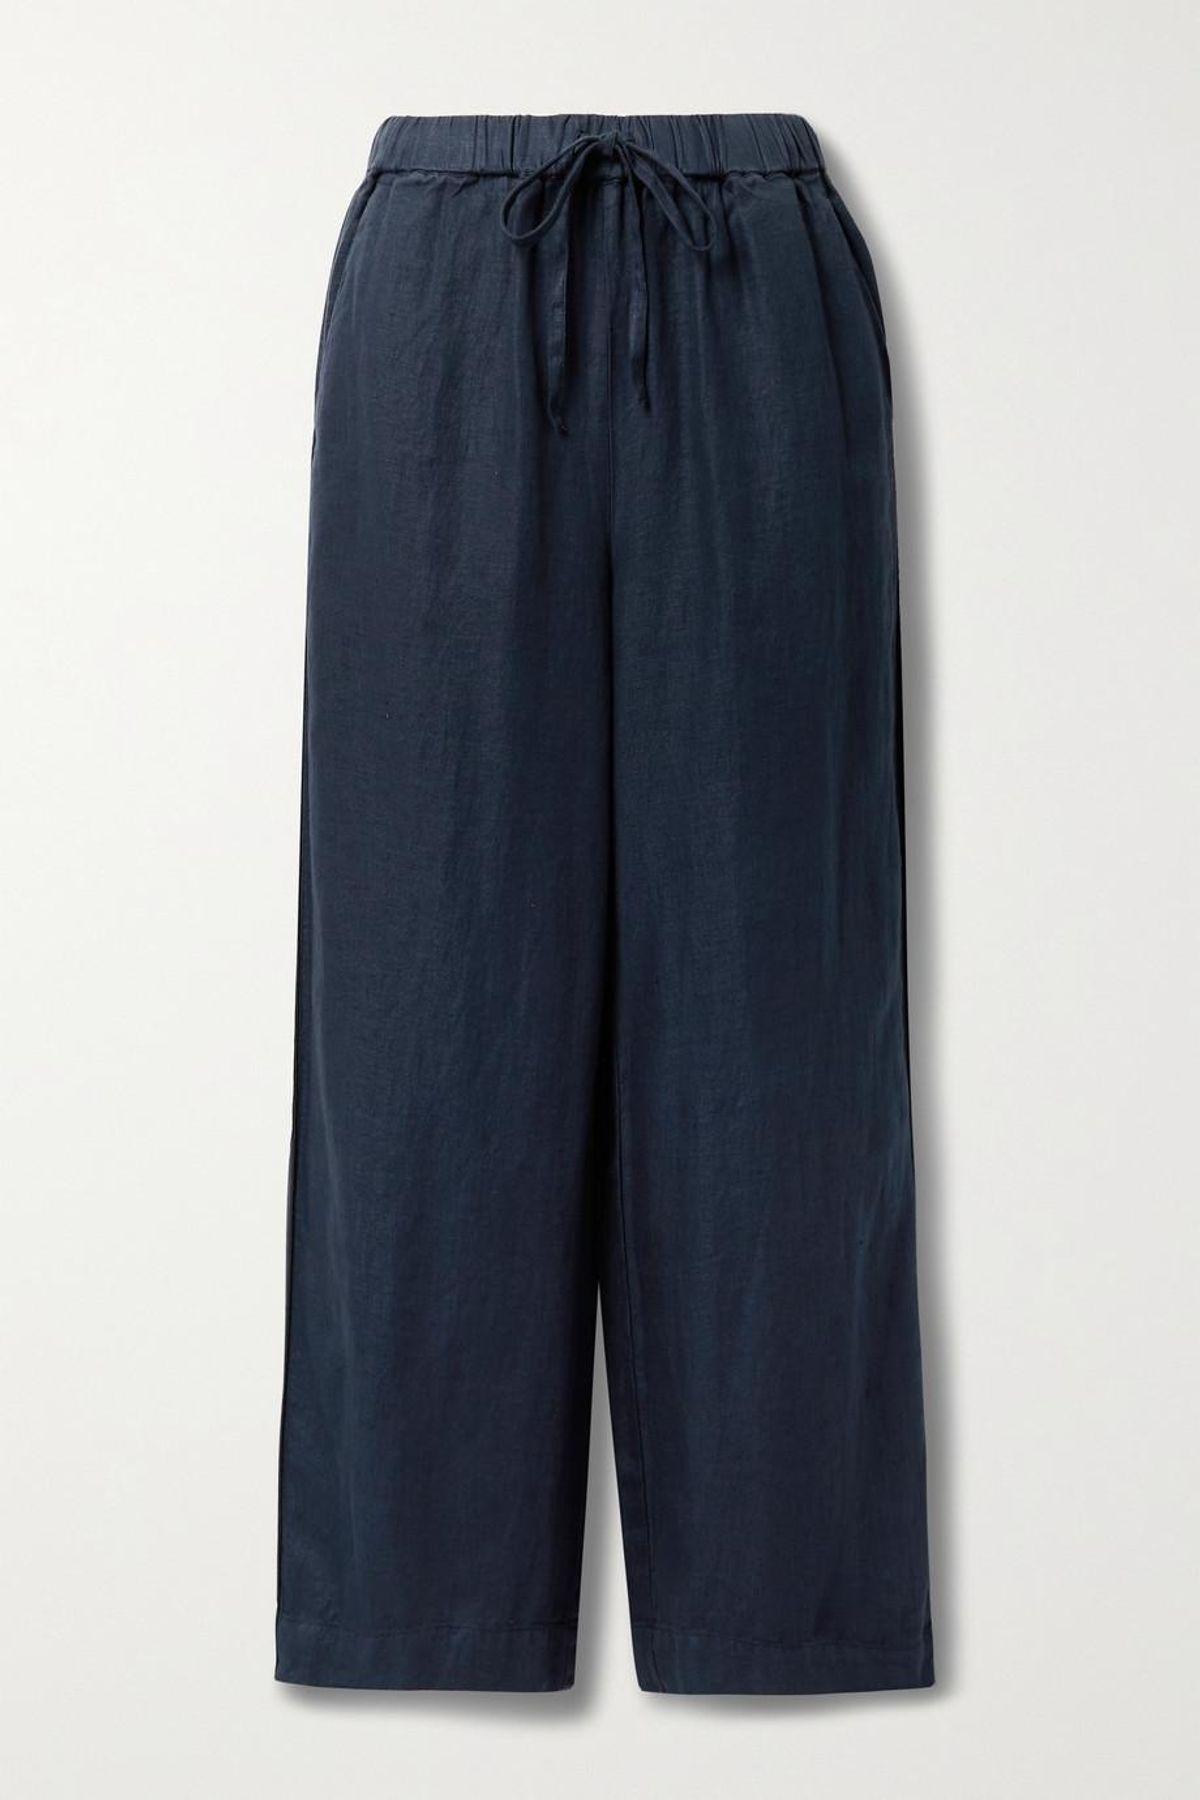 Polly Linen Twill Wide Leg Pants